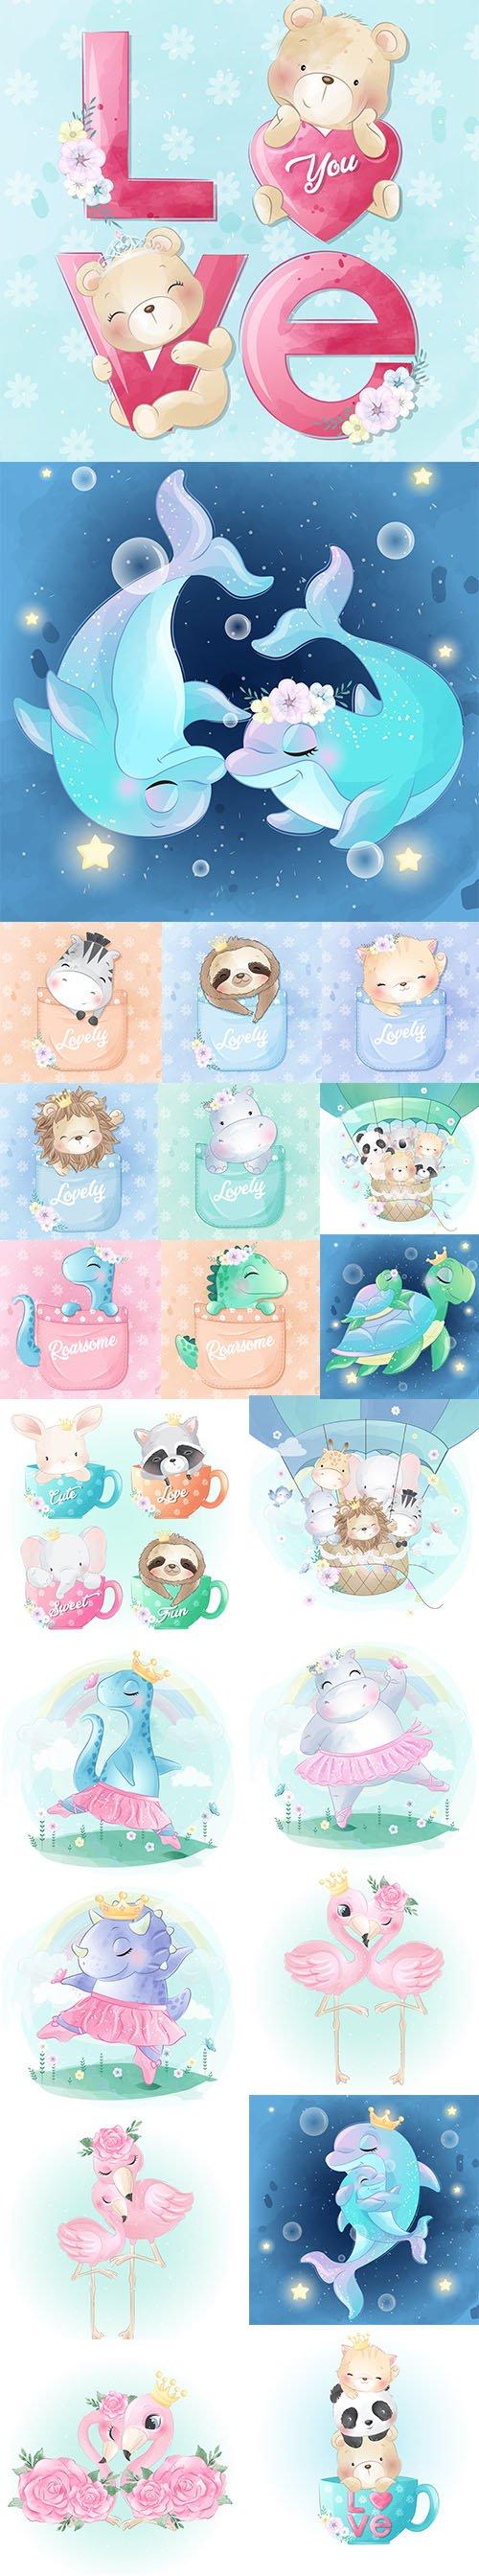 Adorable Little Animals Baby Illustration Set